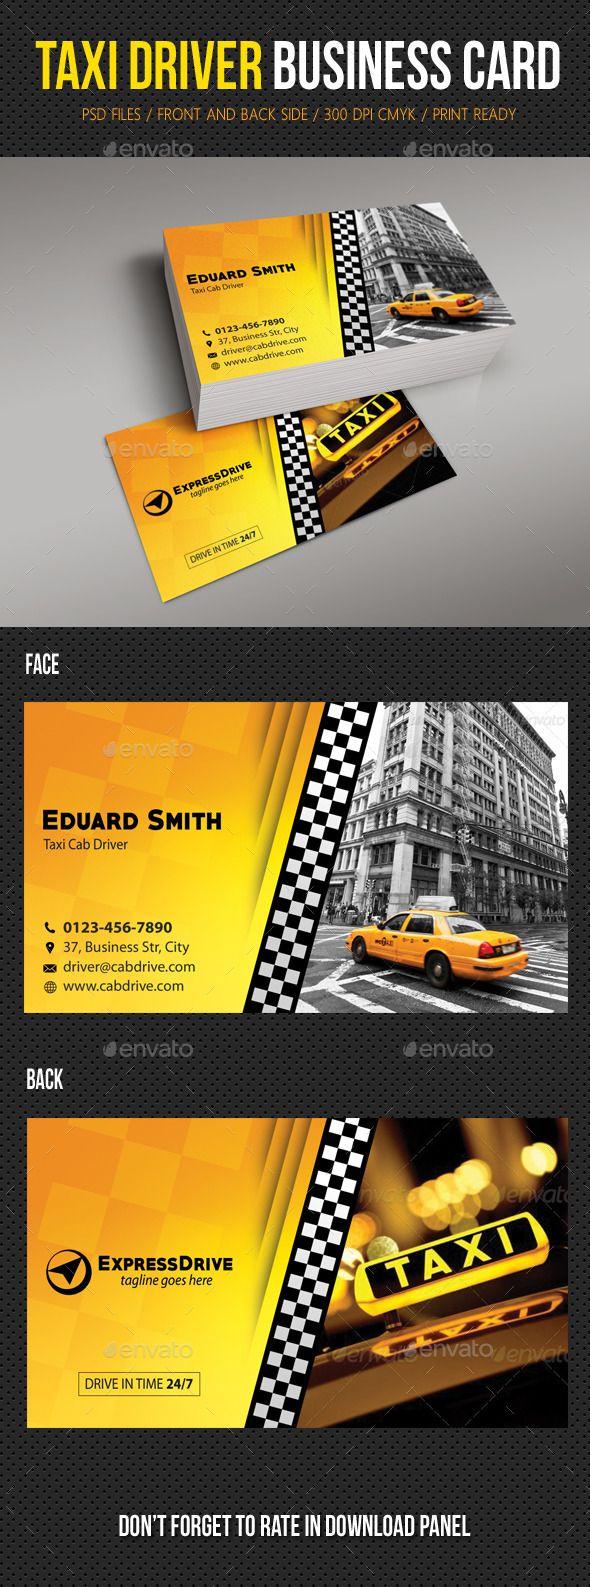 1000 Best Best Business Cards On Pinterest Images On Pinterest